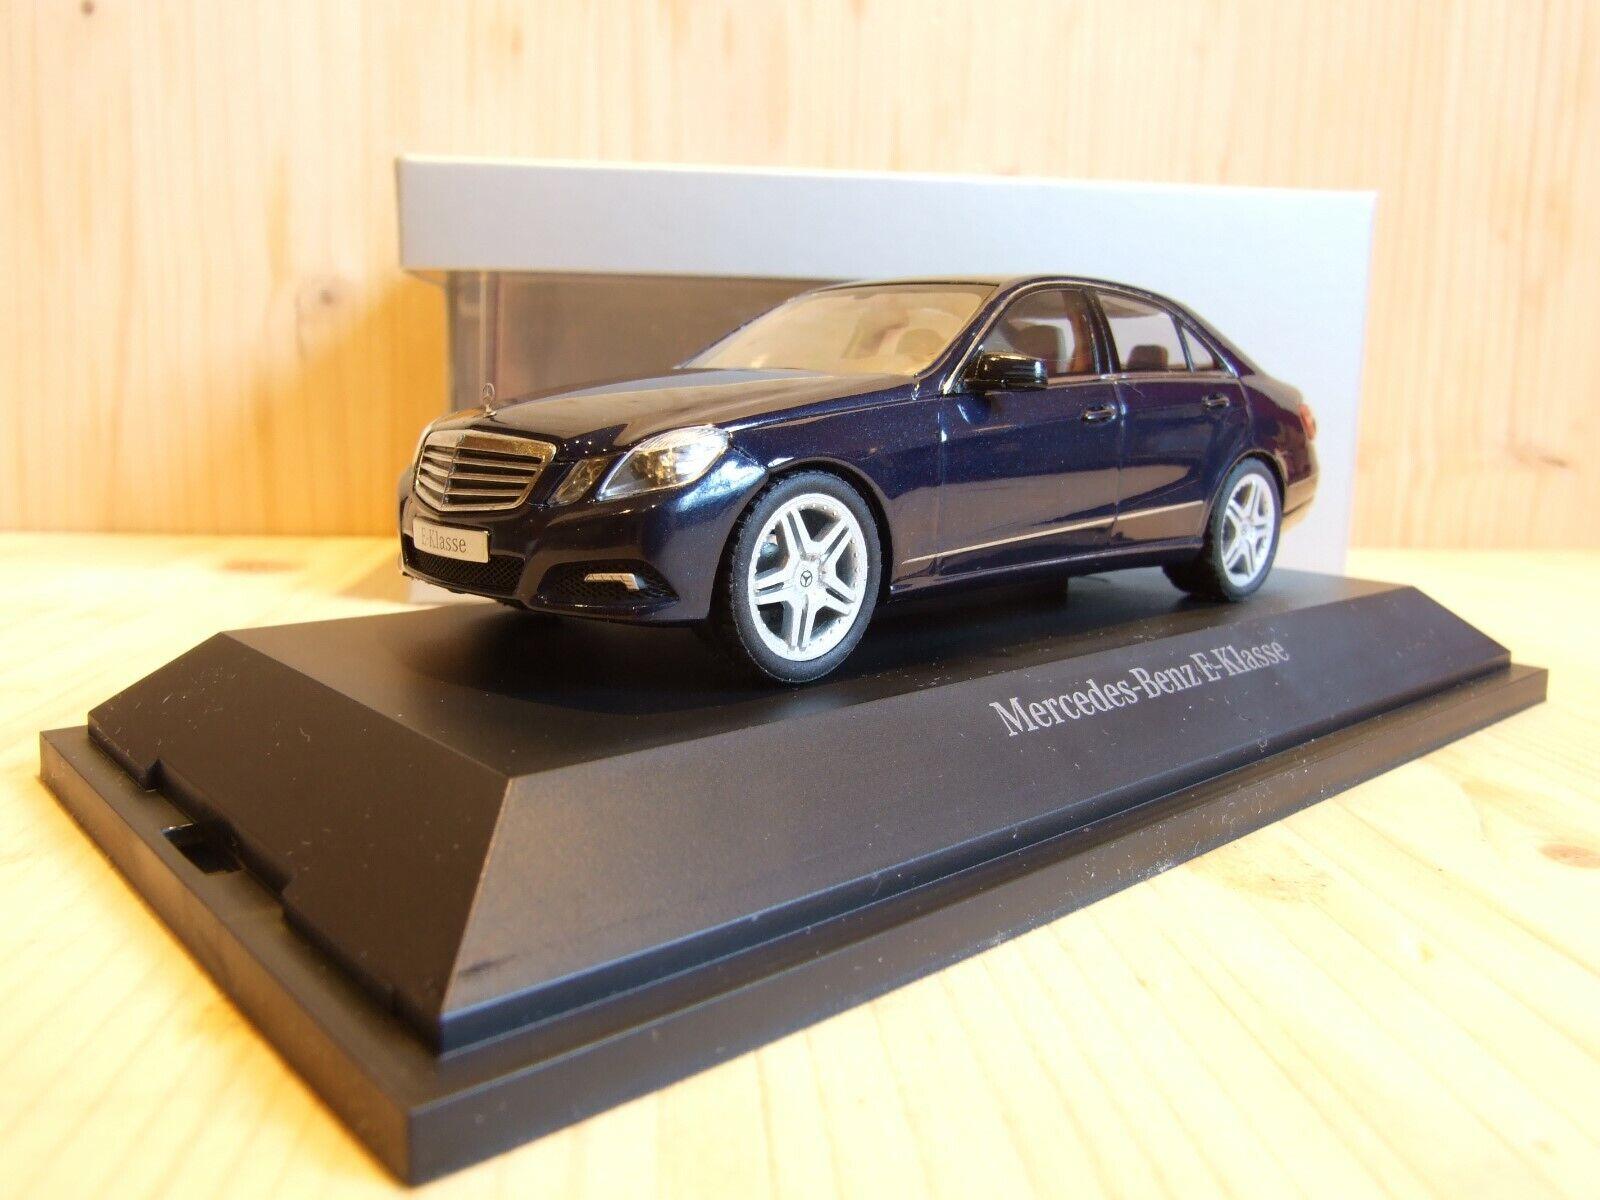 Mercedes-Benz E500, W212, LIM., 1 43, tansanitblaumet., AMG WHEELS, B6 696 0208